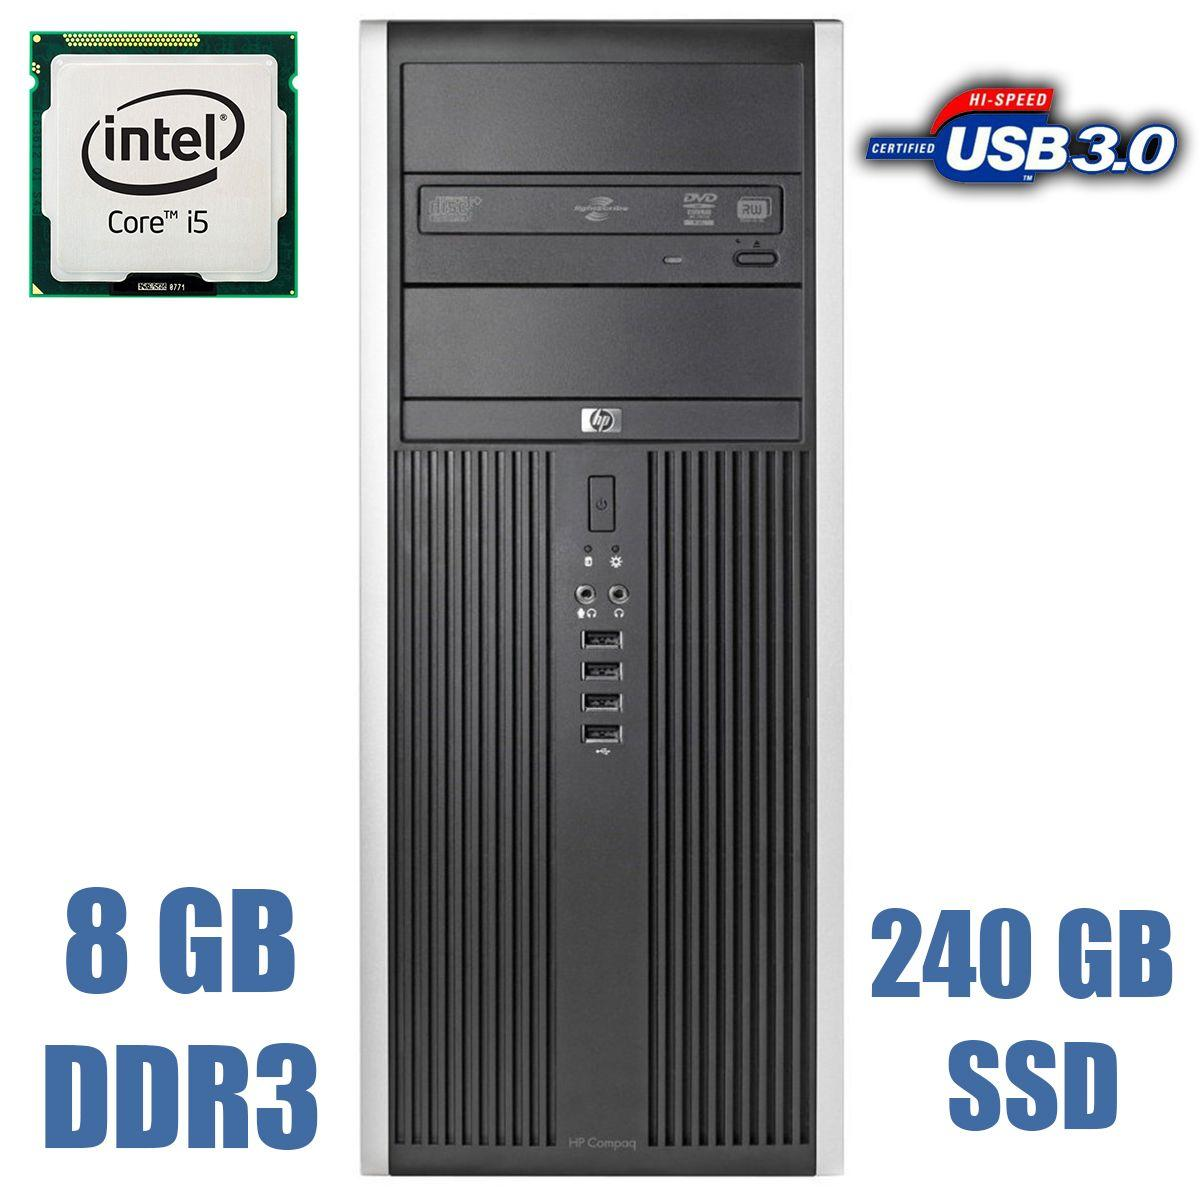 HP Compaq 8300 Elite Tower / Intel Core i5-3470 (4 ядра по 3.20 - 3.60 GHz) / 8GB DDR3 / new! 240GB SSD + 500GB HDD